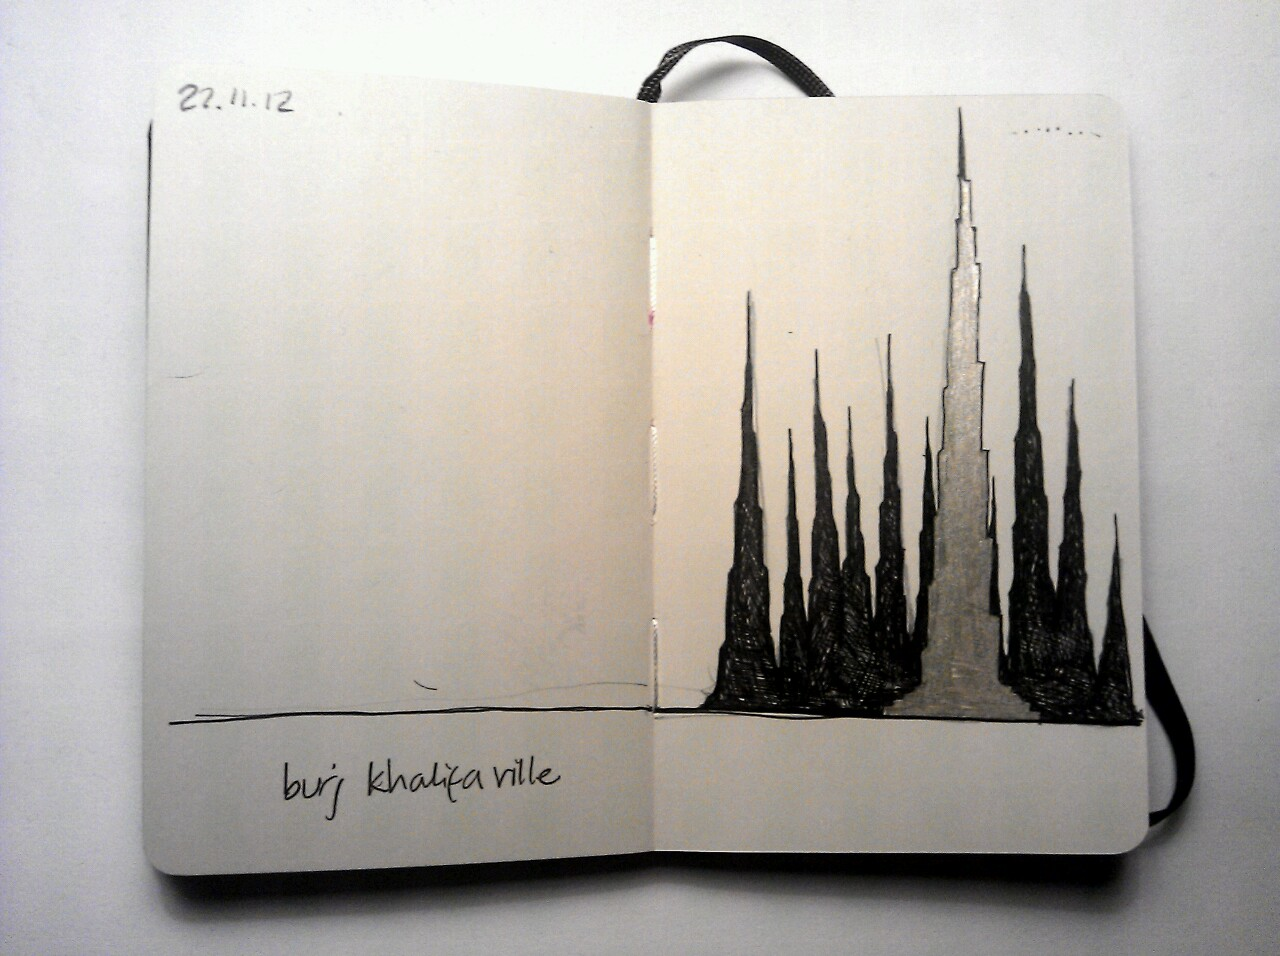 365 drawings later … day 296 … burj khalifa ville